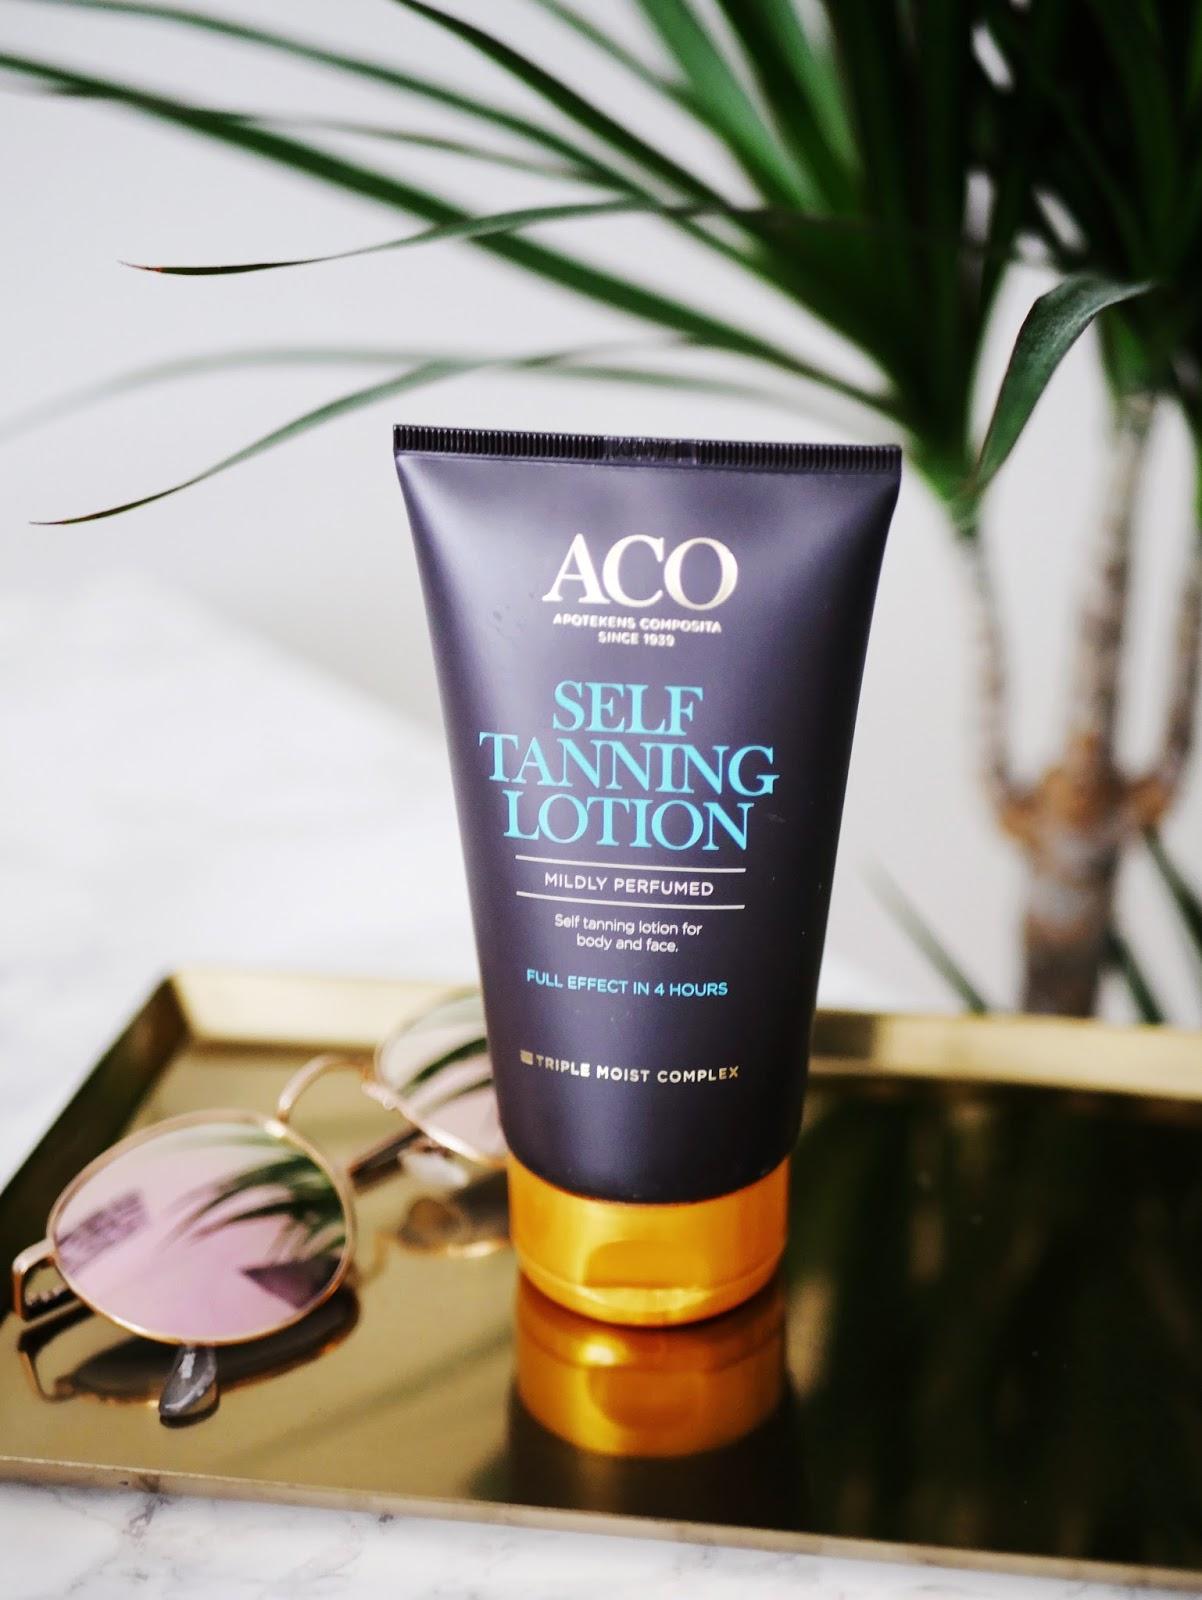 aco self tanning lotion kokemuksia